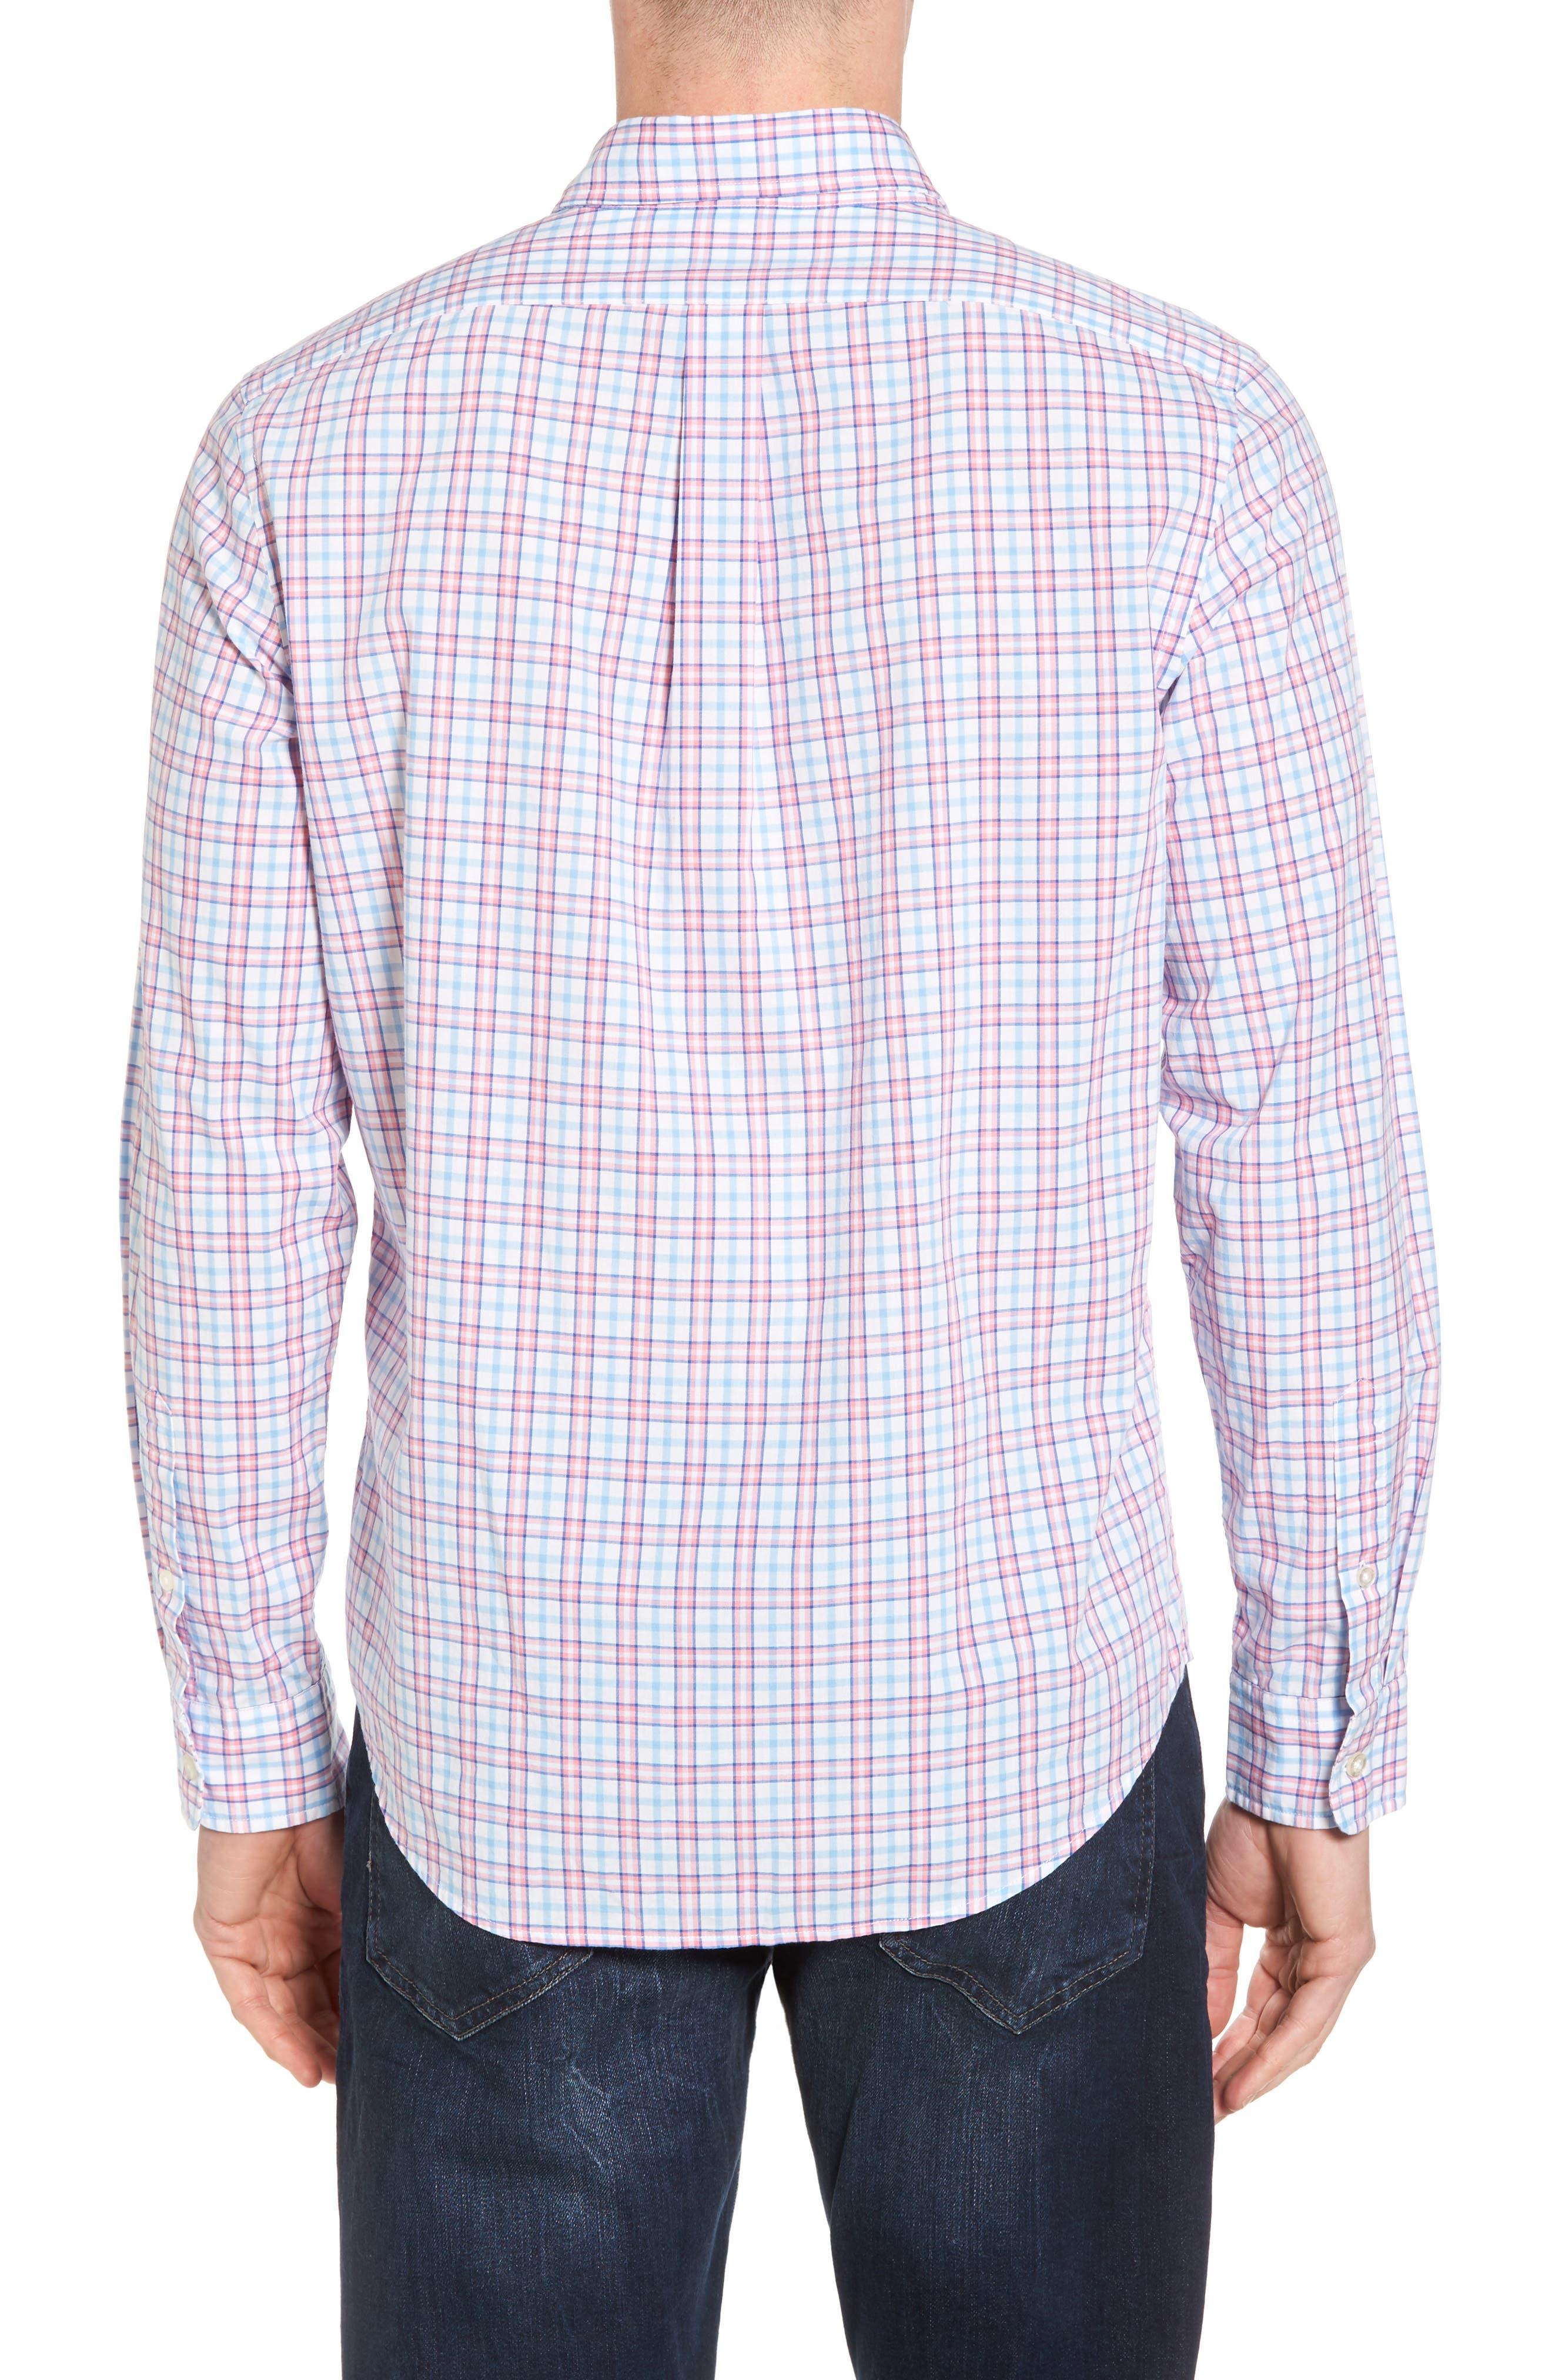 Kennard Tucker Slim Fit Plaid Sport Shirt,                             Alternate thumbnail 2, color,                             956